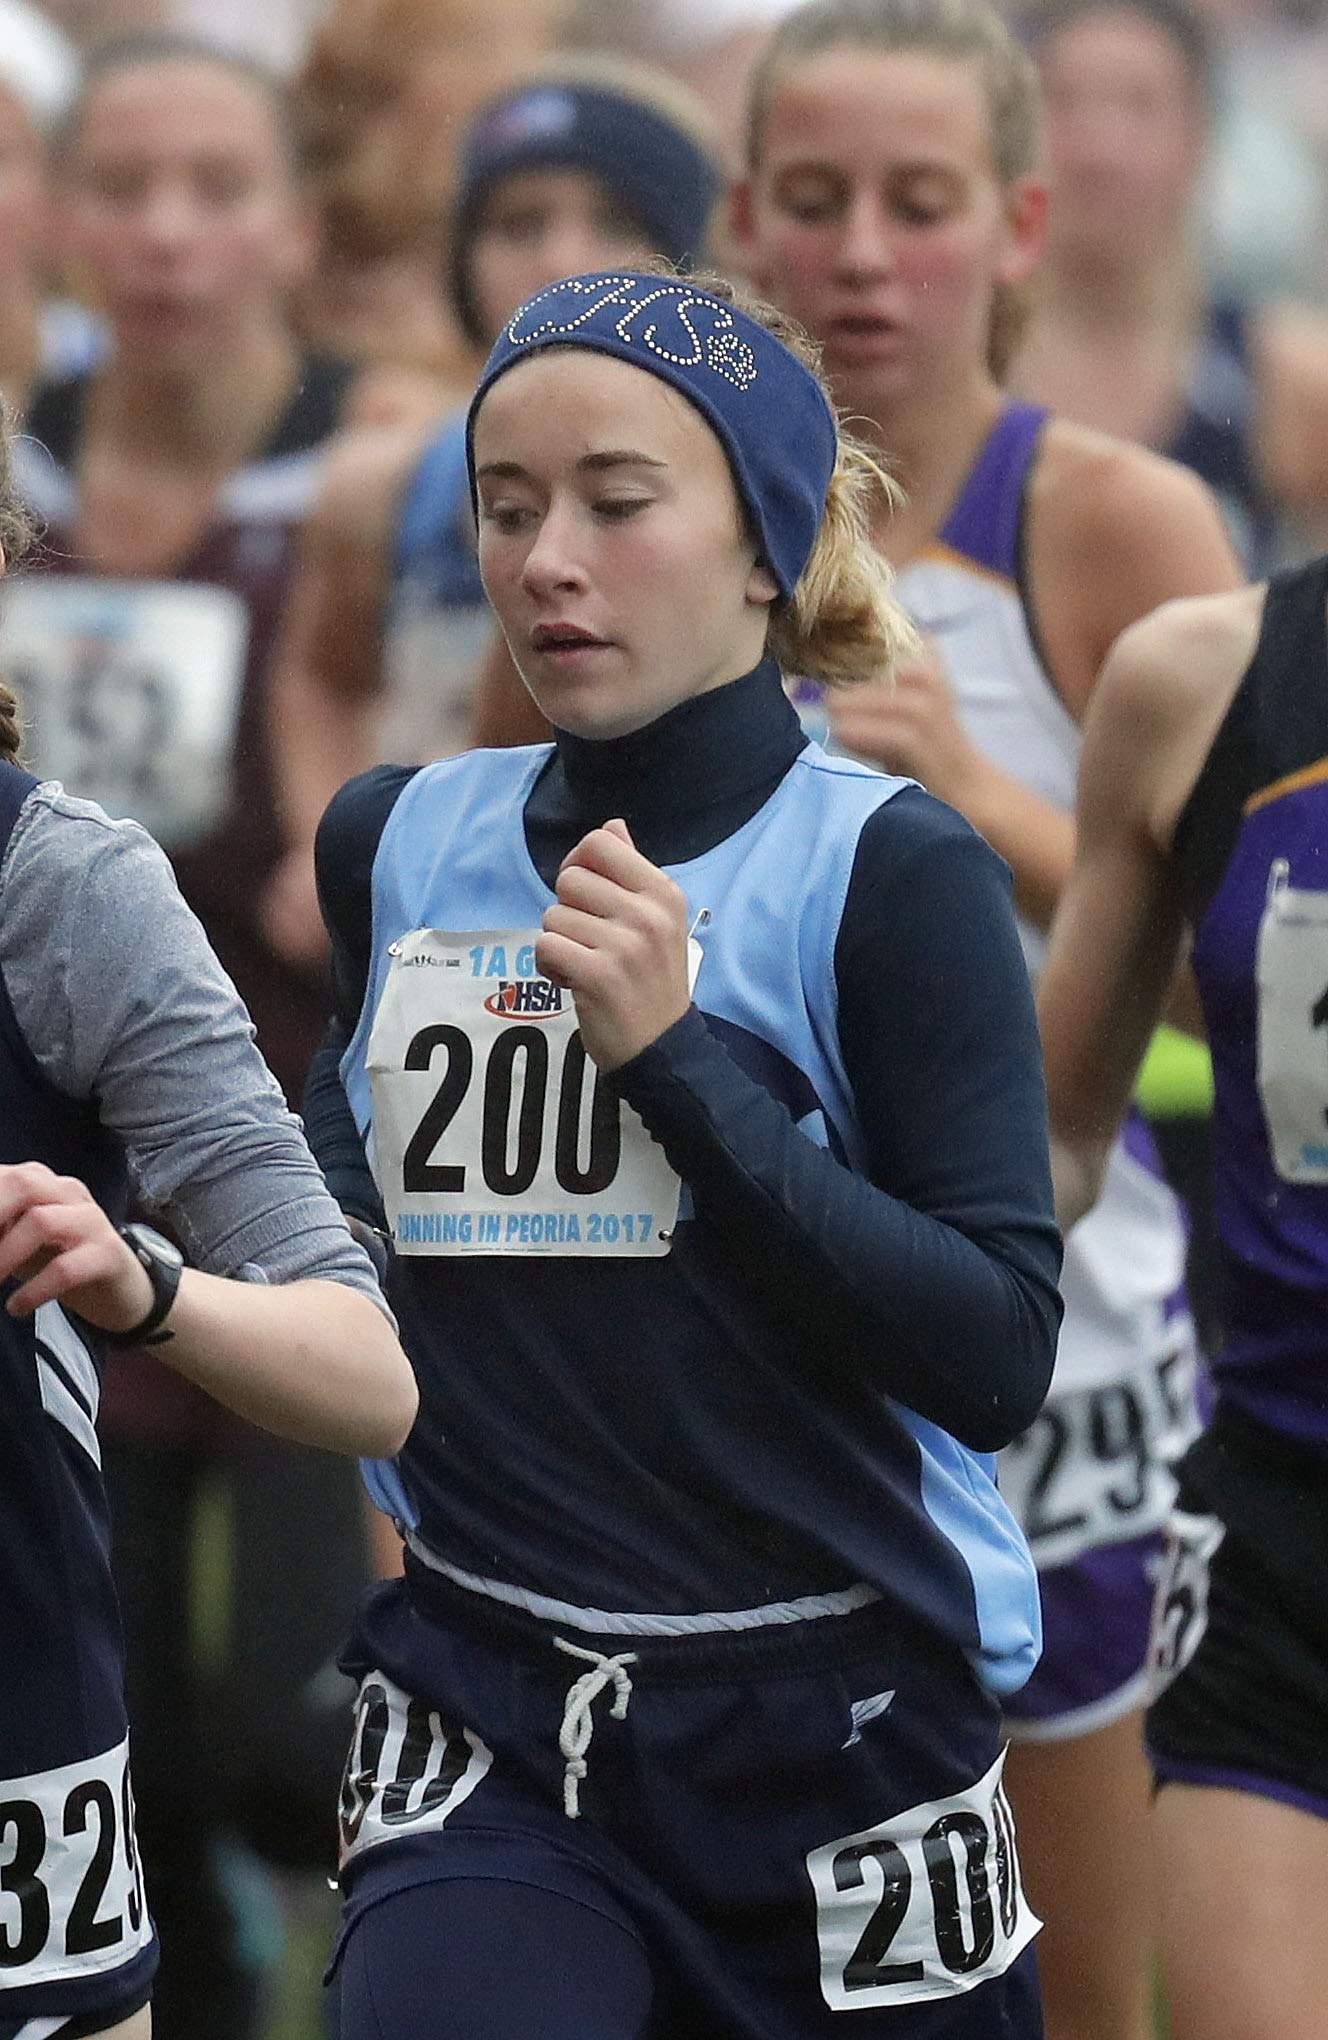 Pinckneyville's Dakota Krone (200) runs in the girls Class 1A cross-country finals Saturday in Peoria.